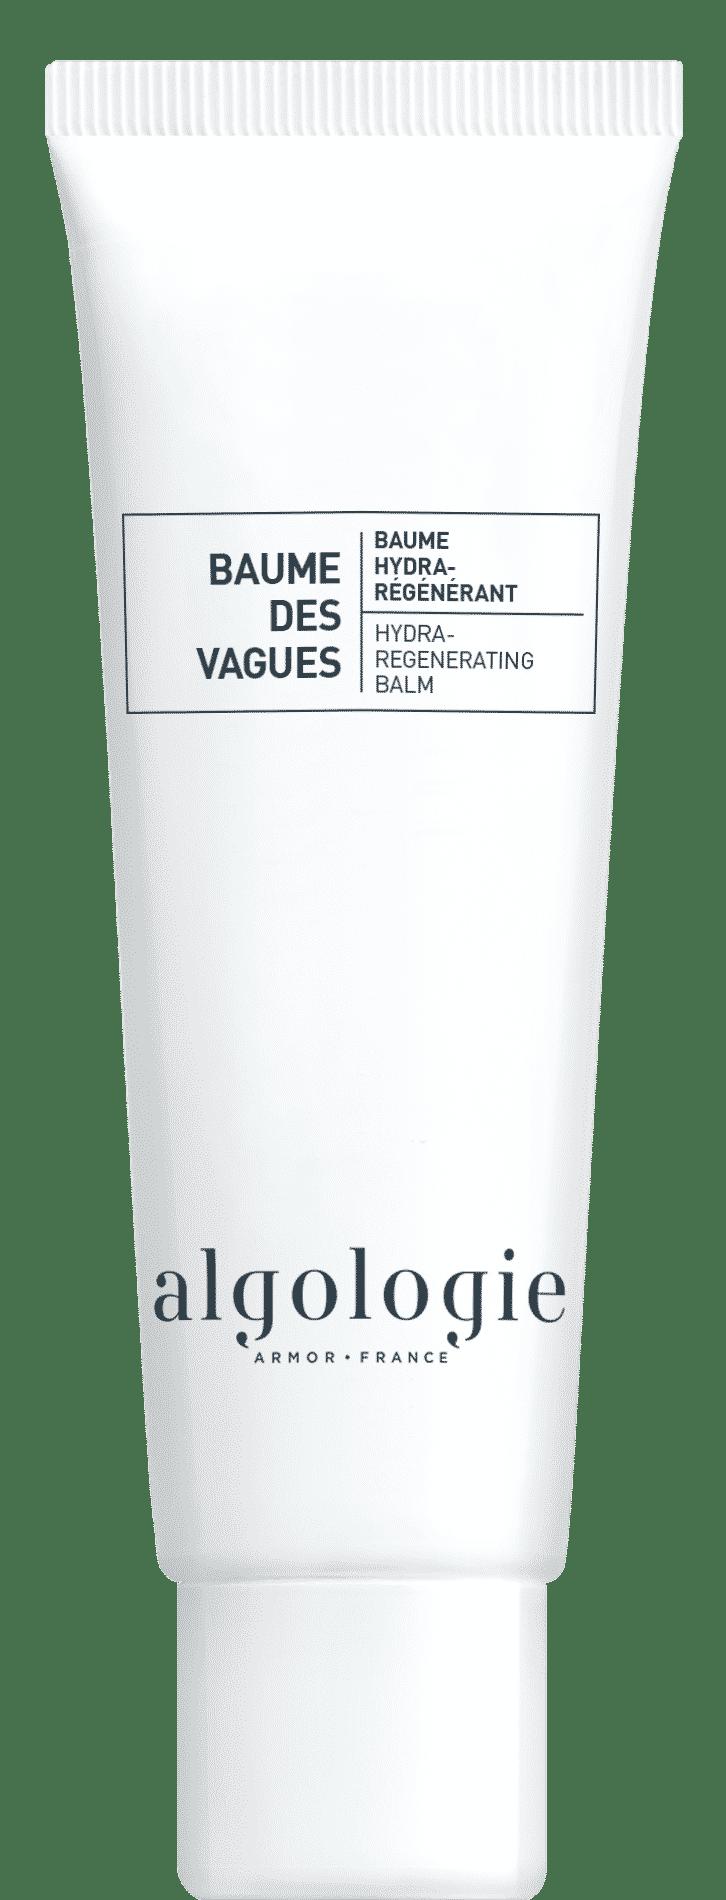 Regenerative Cream - Hydra Regenerating Balm- Rich day or night regenerative cream